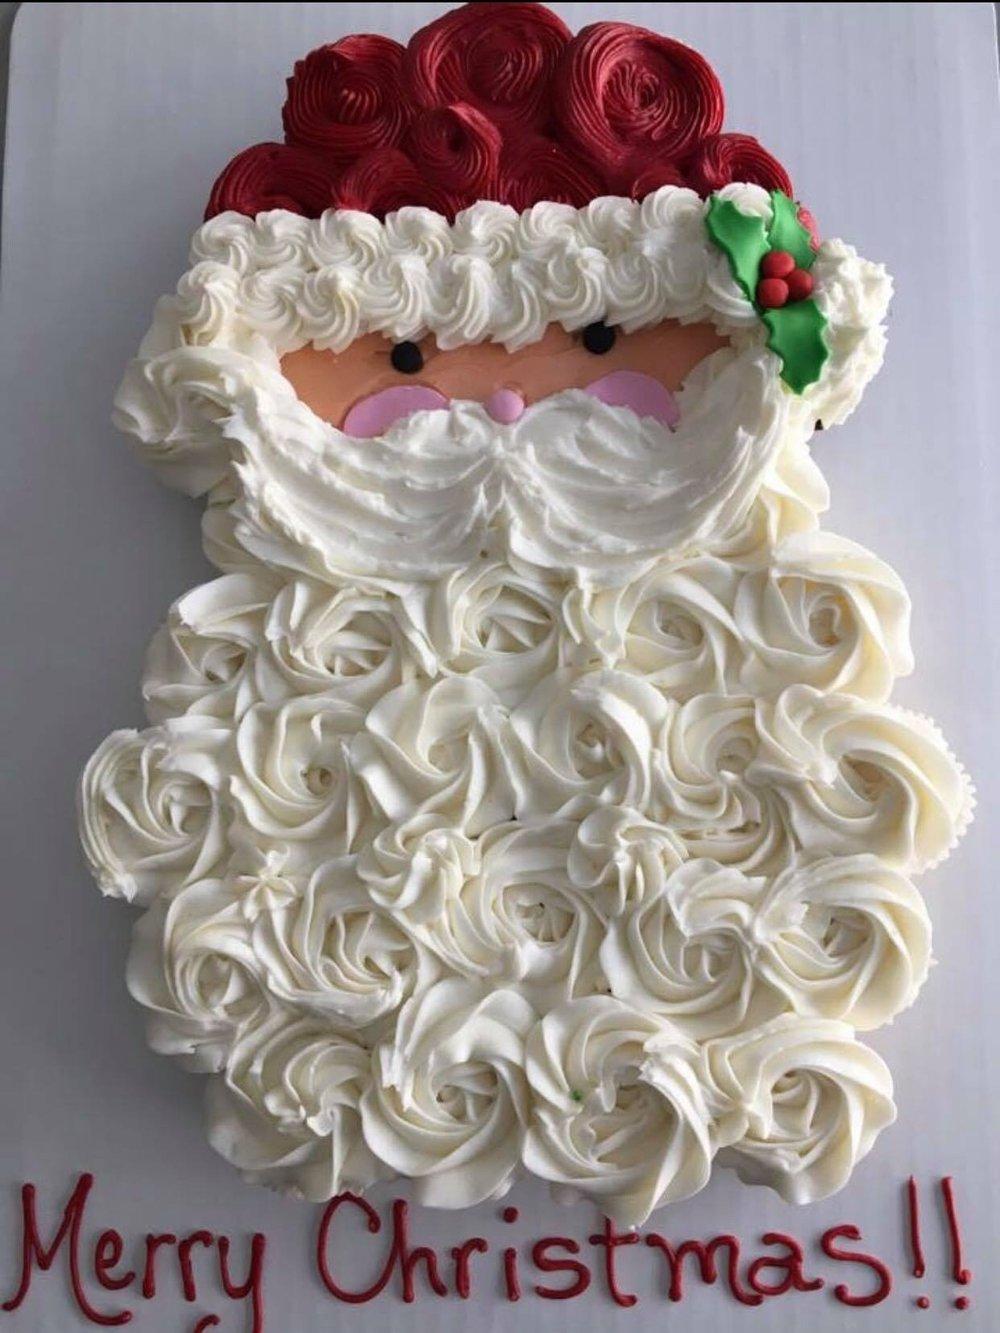 Santa Cupcake Cake - $55 3 dozen mini cupcakes$85 3 dozen regular cupcakes